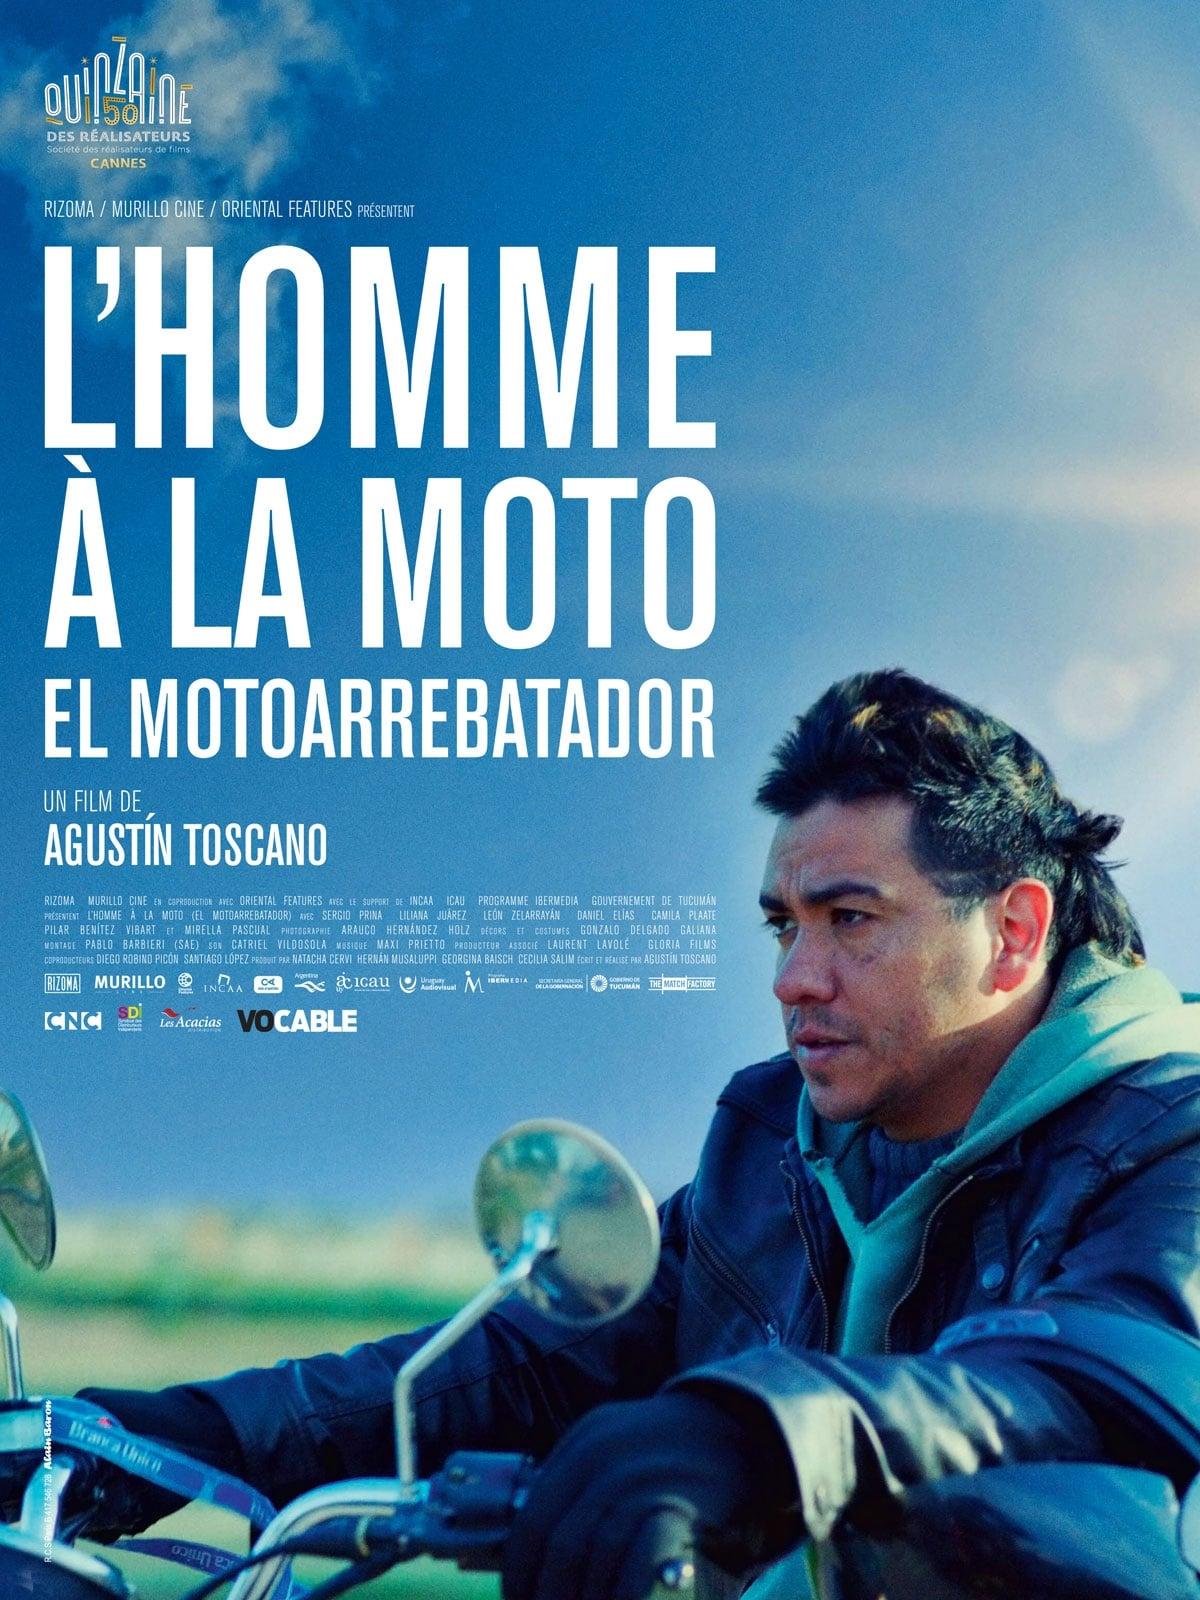 voir film El motoarrebatador streaming